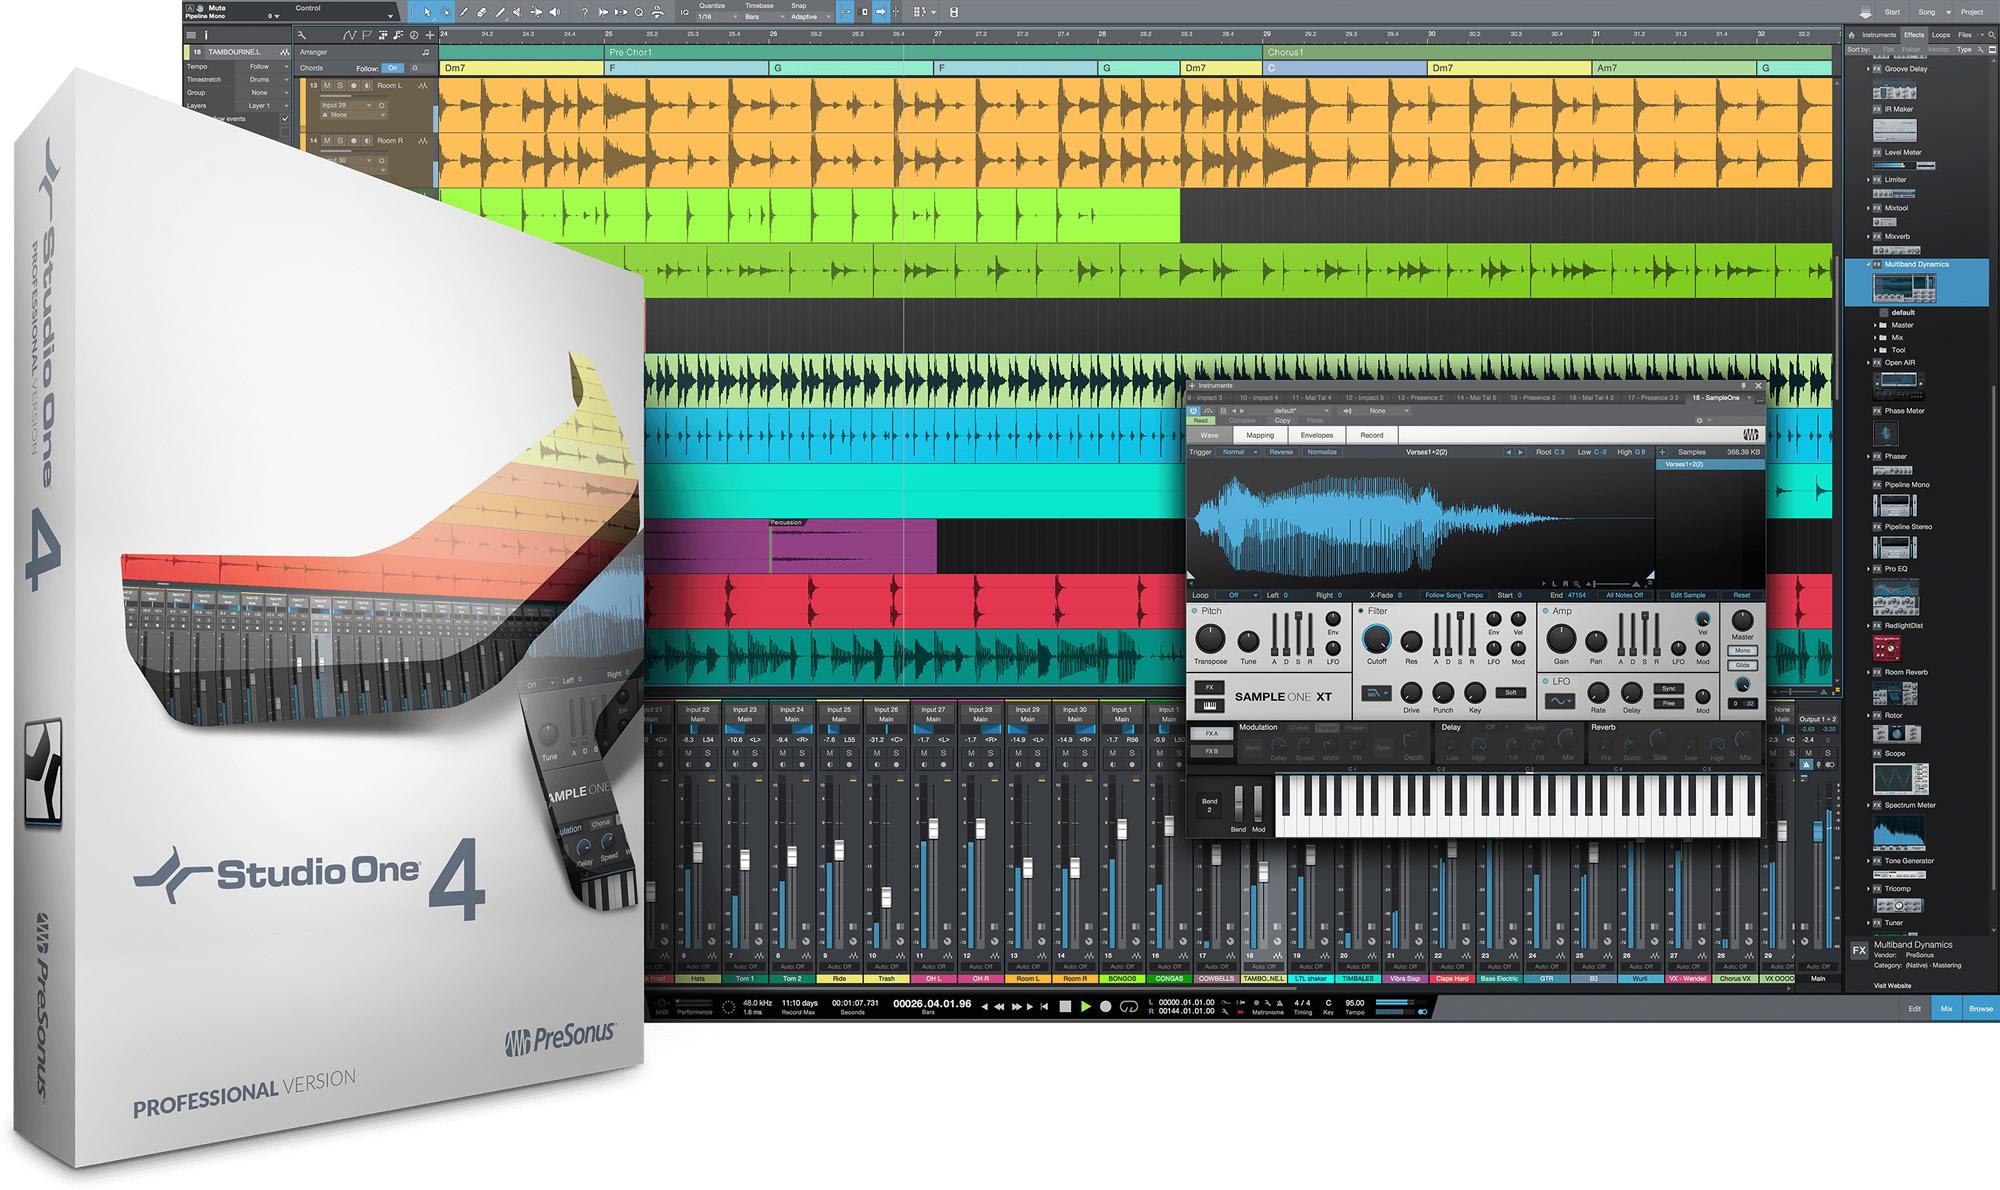 KVR: PreSonus releases Studio One 4